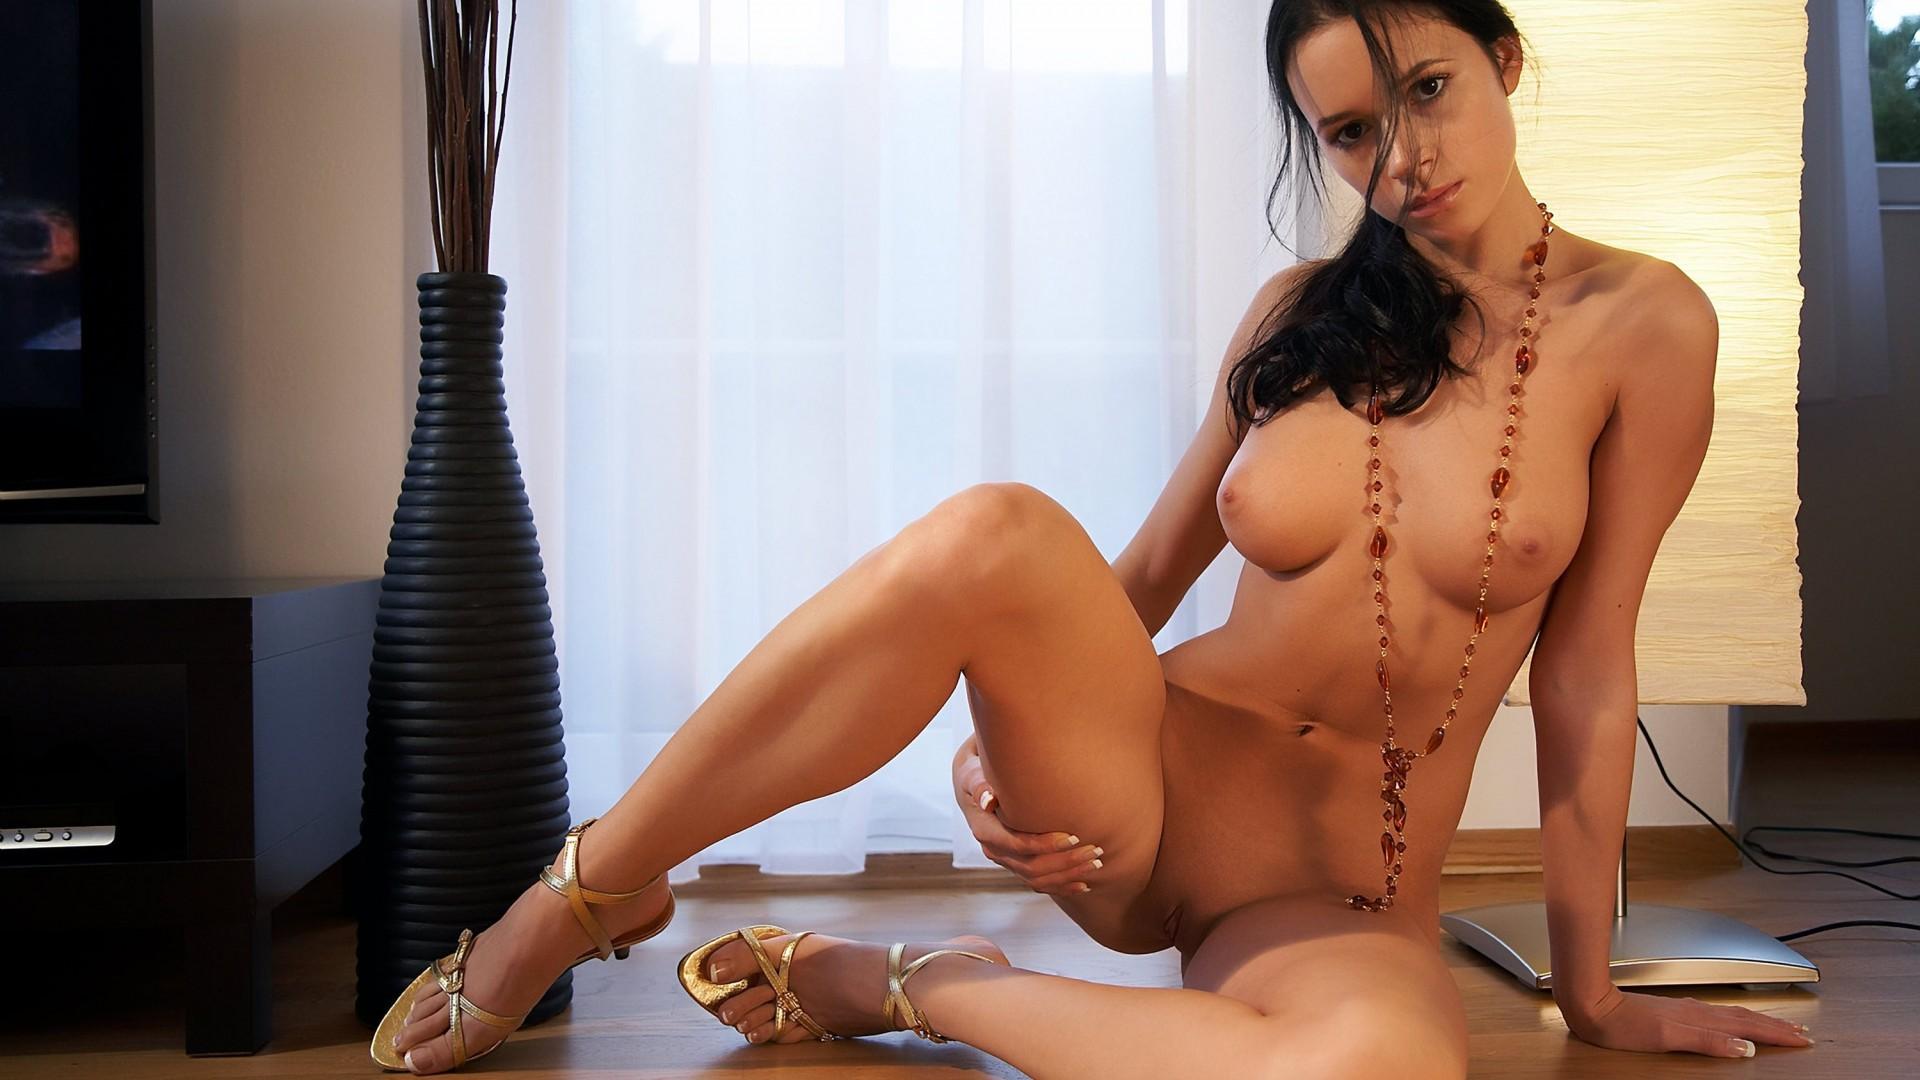 Фото эротика на шпильках, На каблуках секс фото 8 фотография